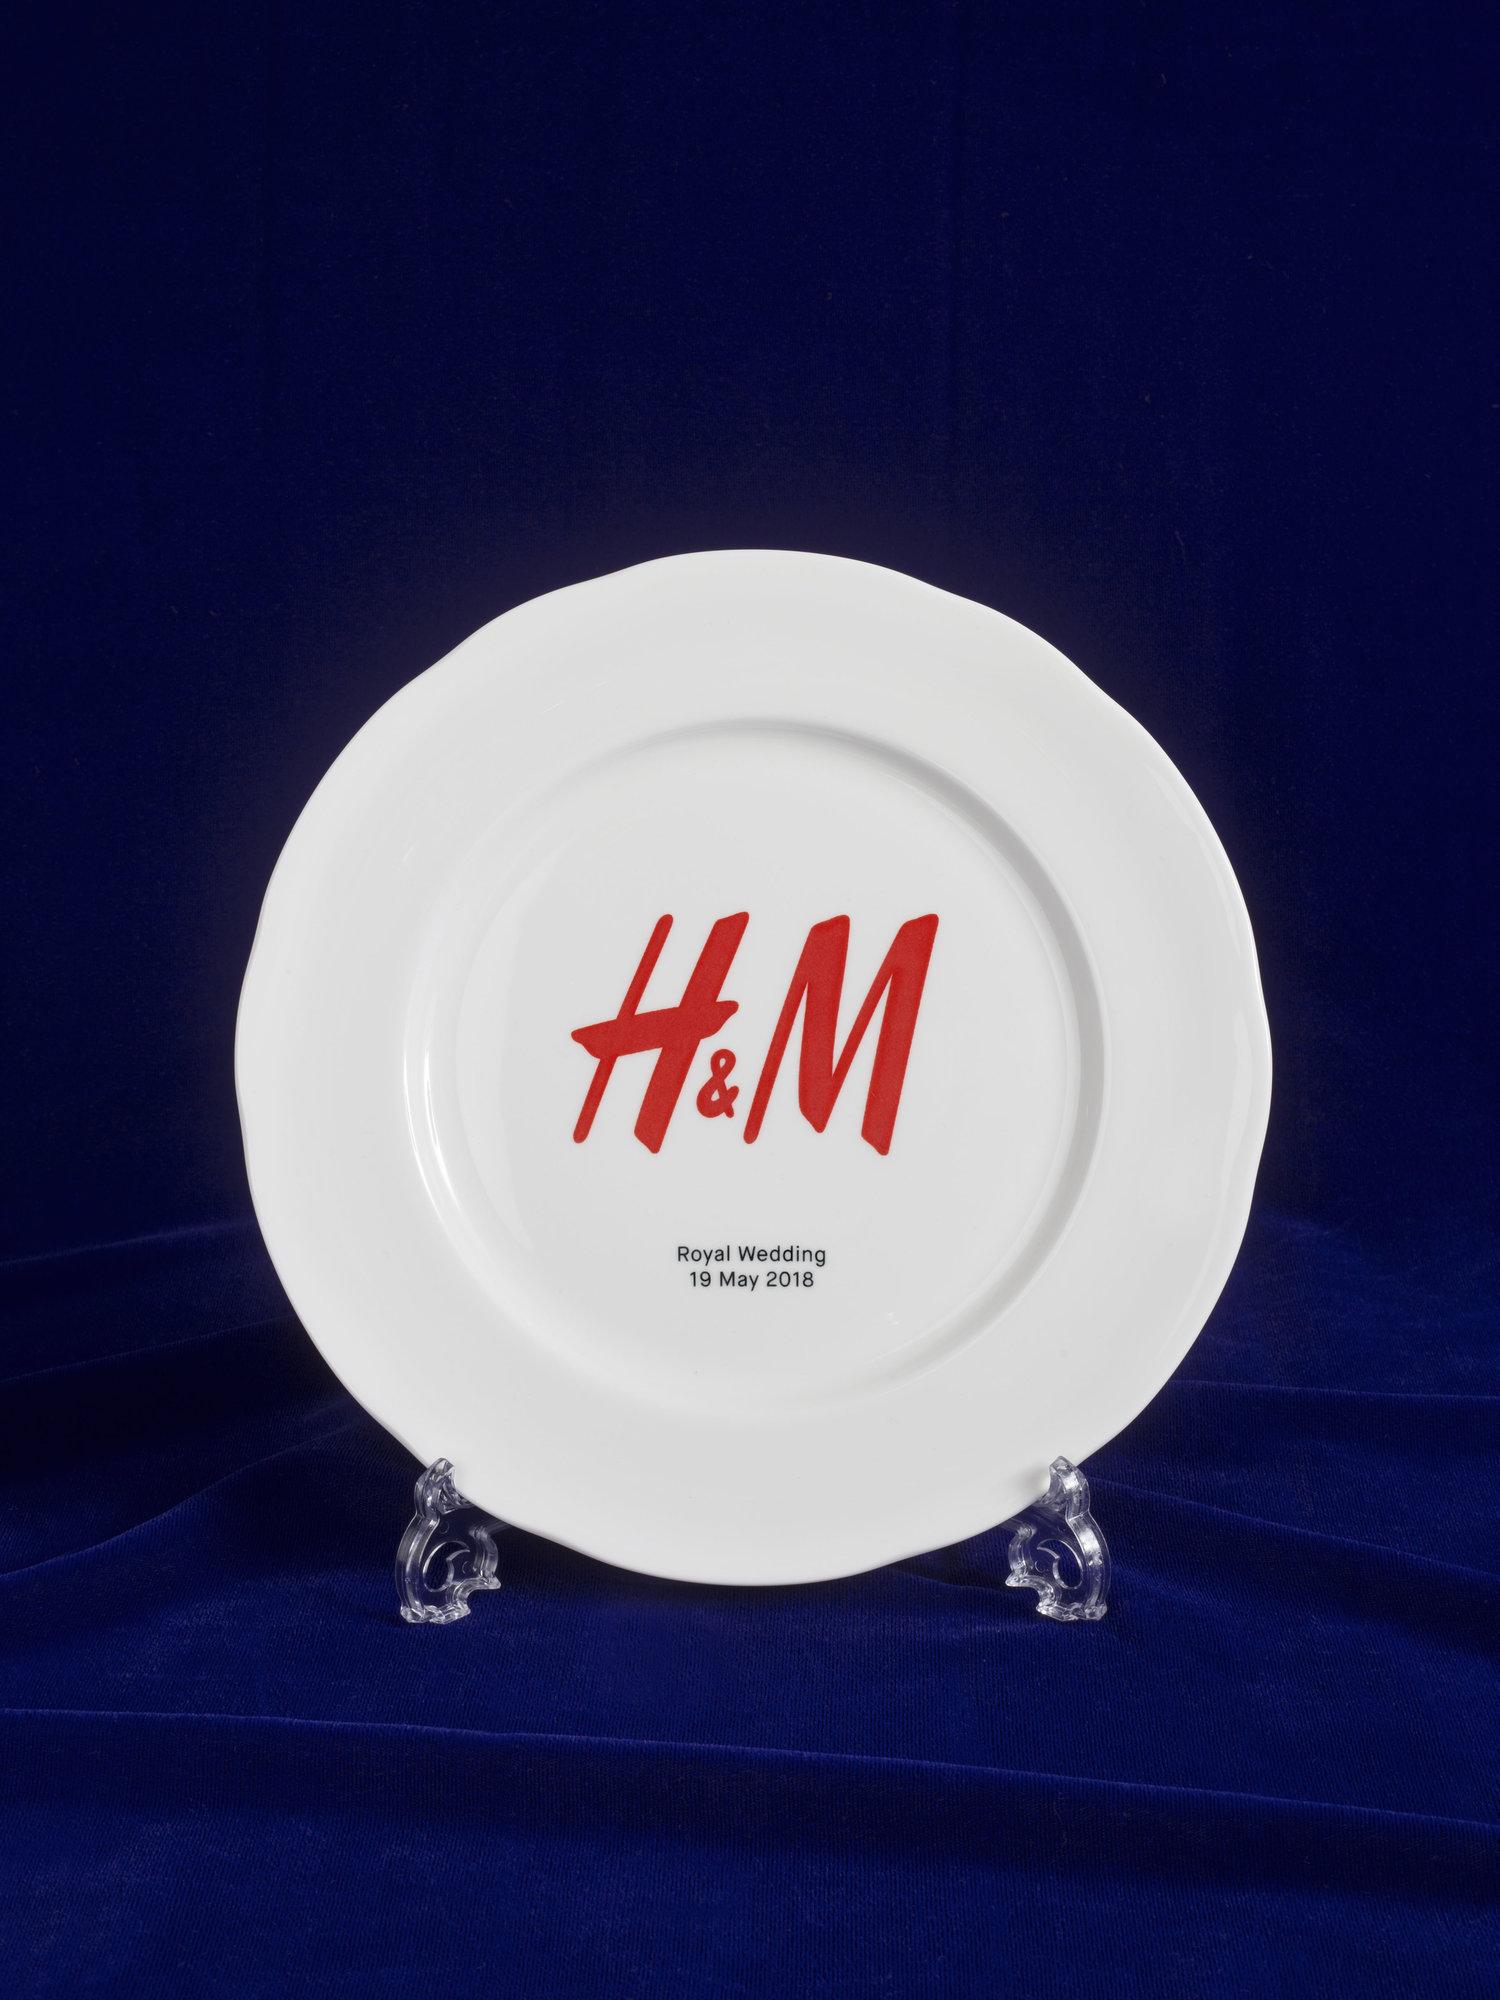 H&M Harry and Meghan Plate.jpg